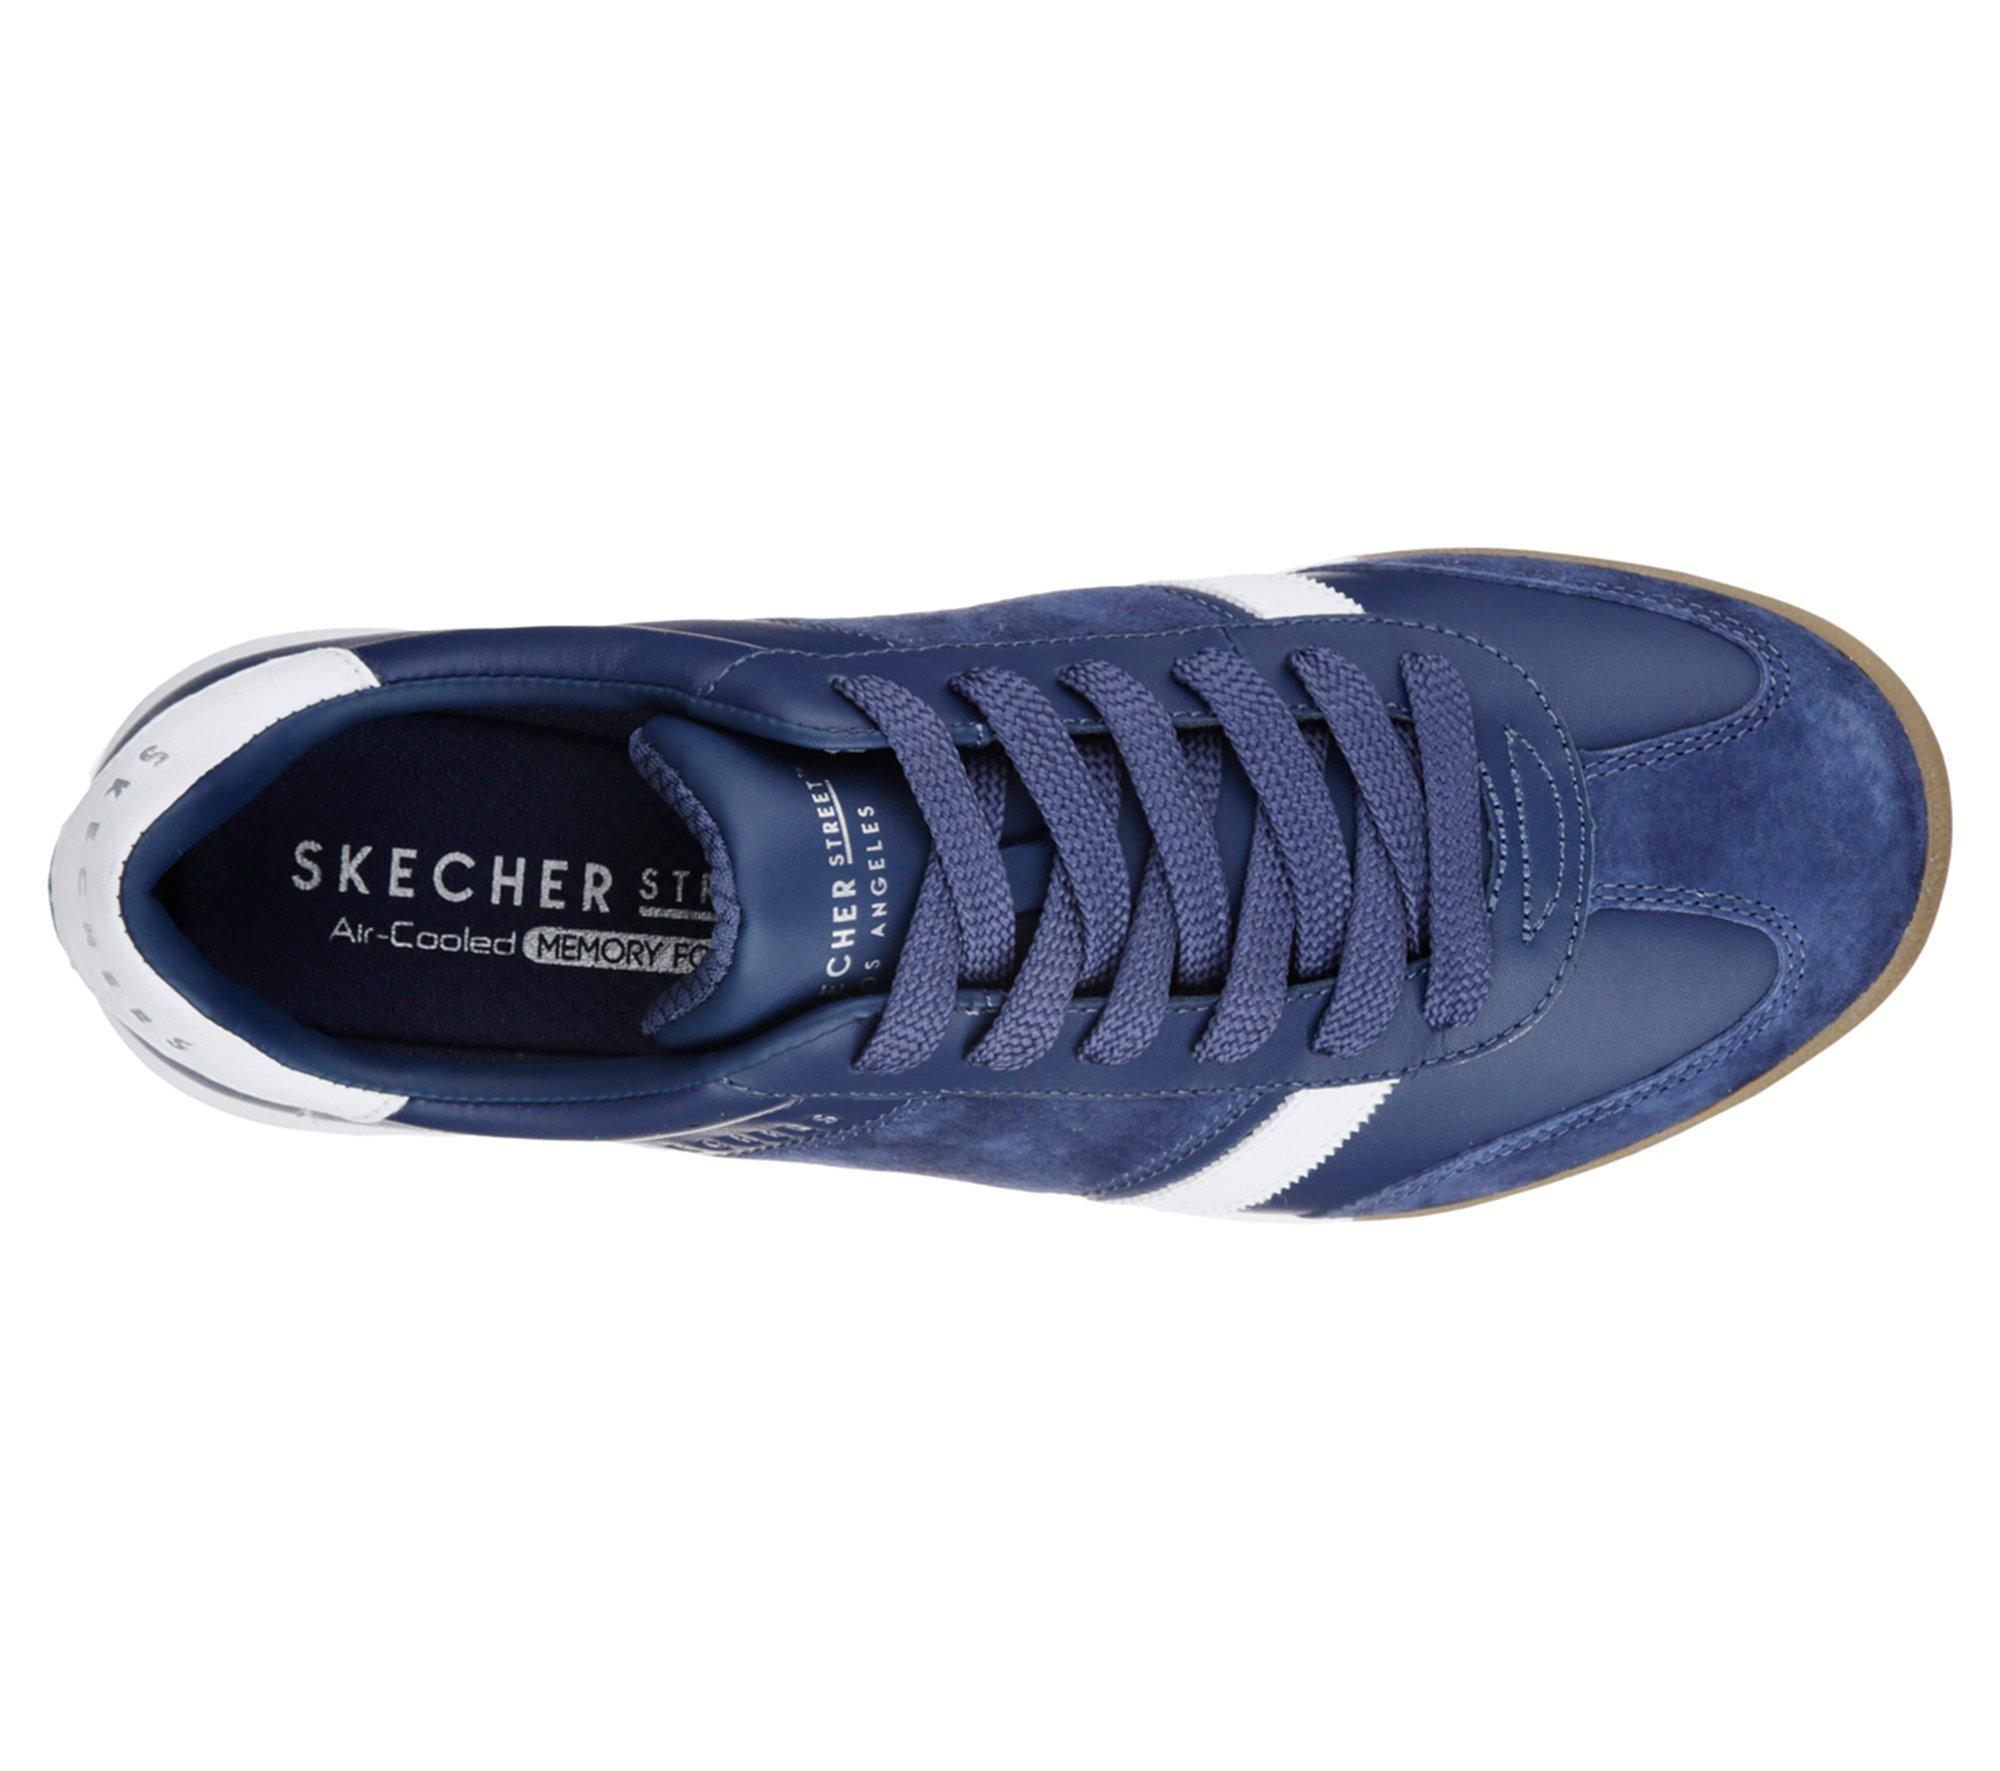 Skechers Leather Zinger - Scobie in